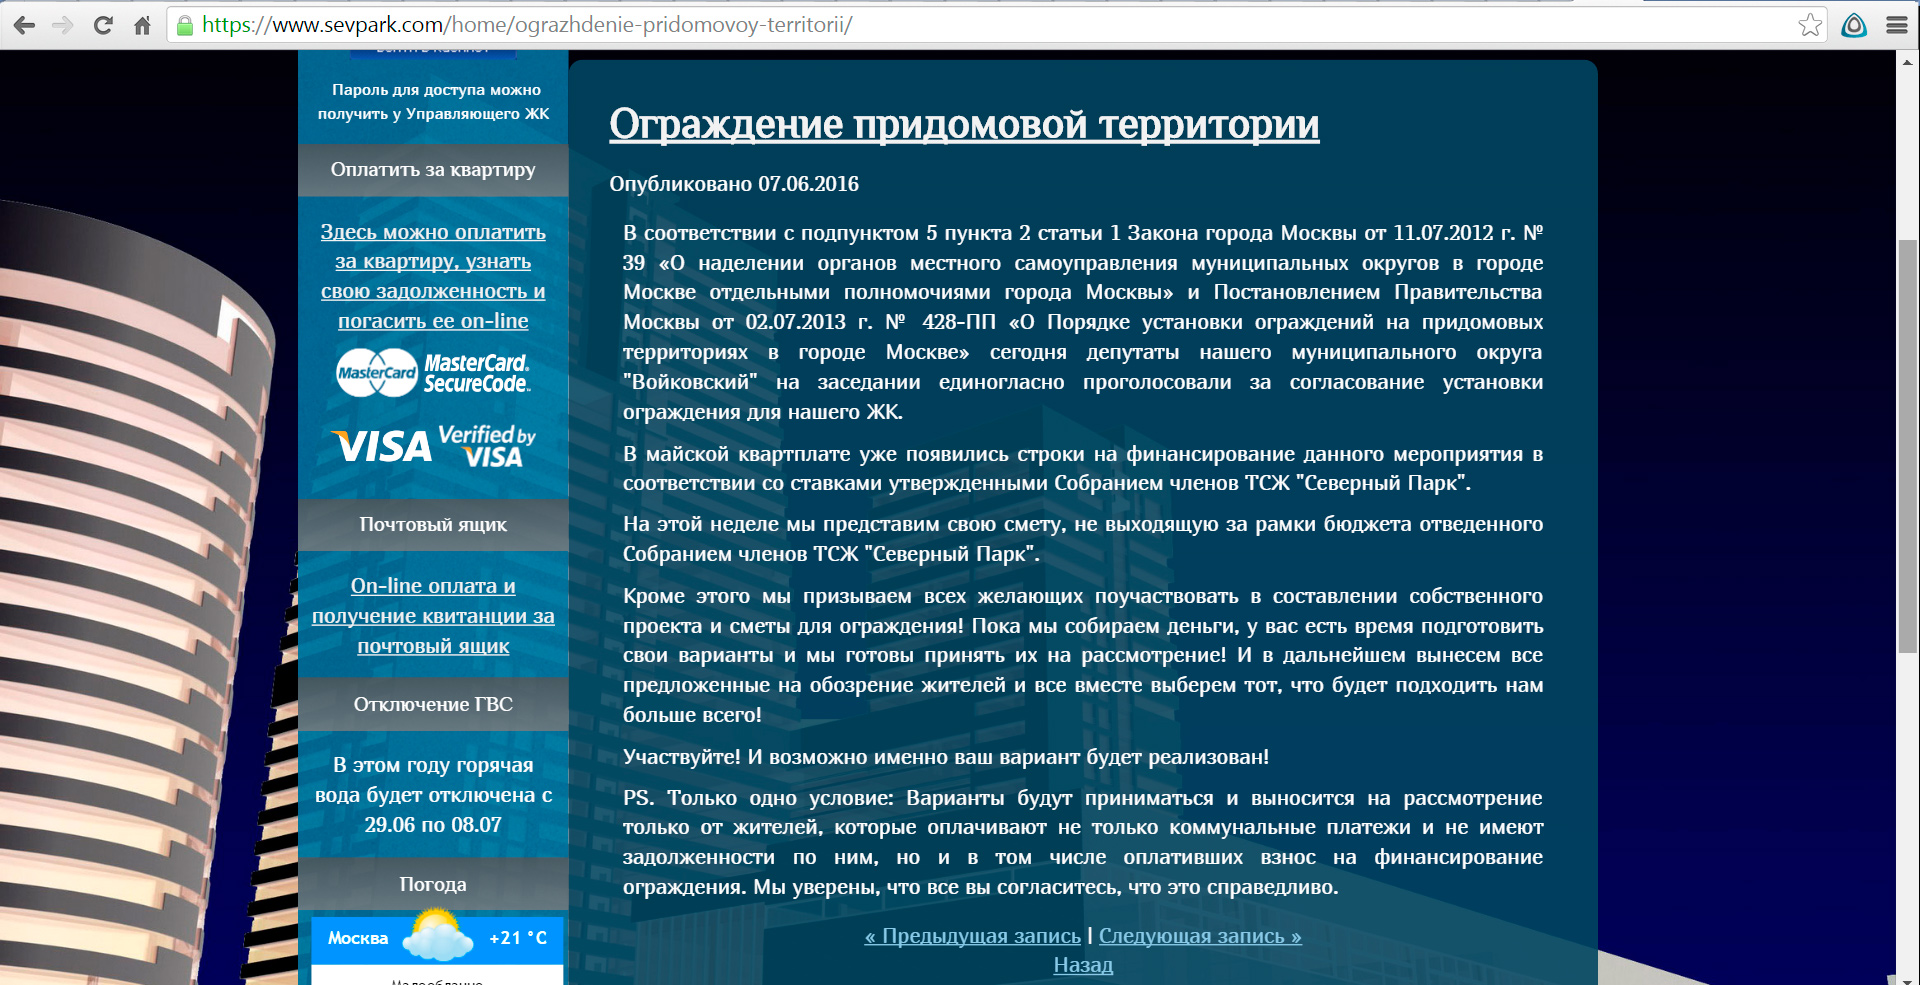 gdz-5-klass-po-russkomu-yaziku-kupalova-eremeeva-lidman-orlova